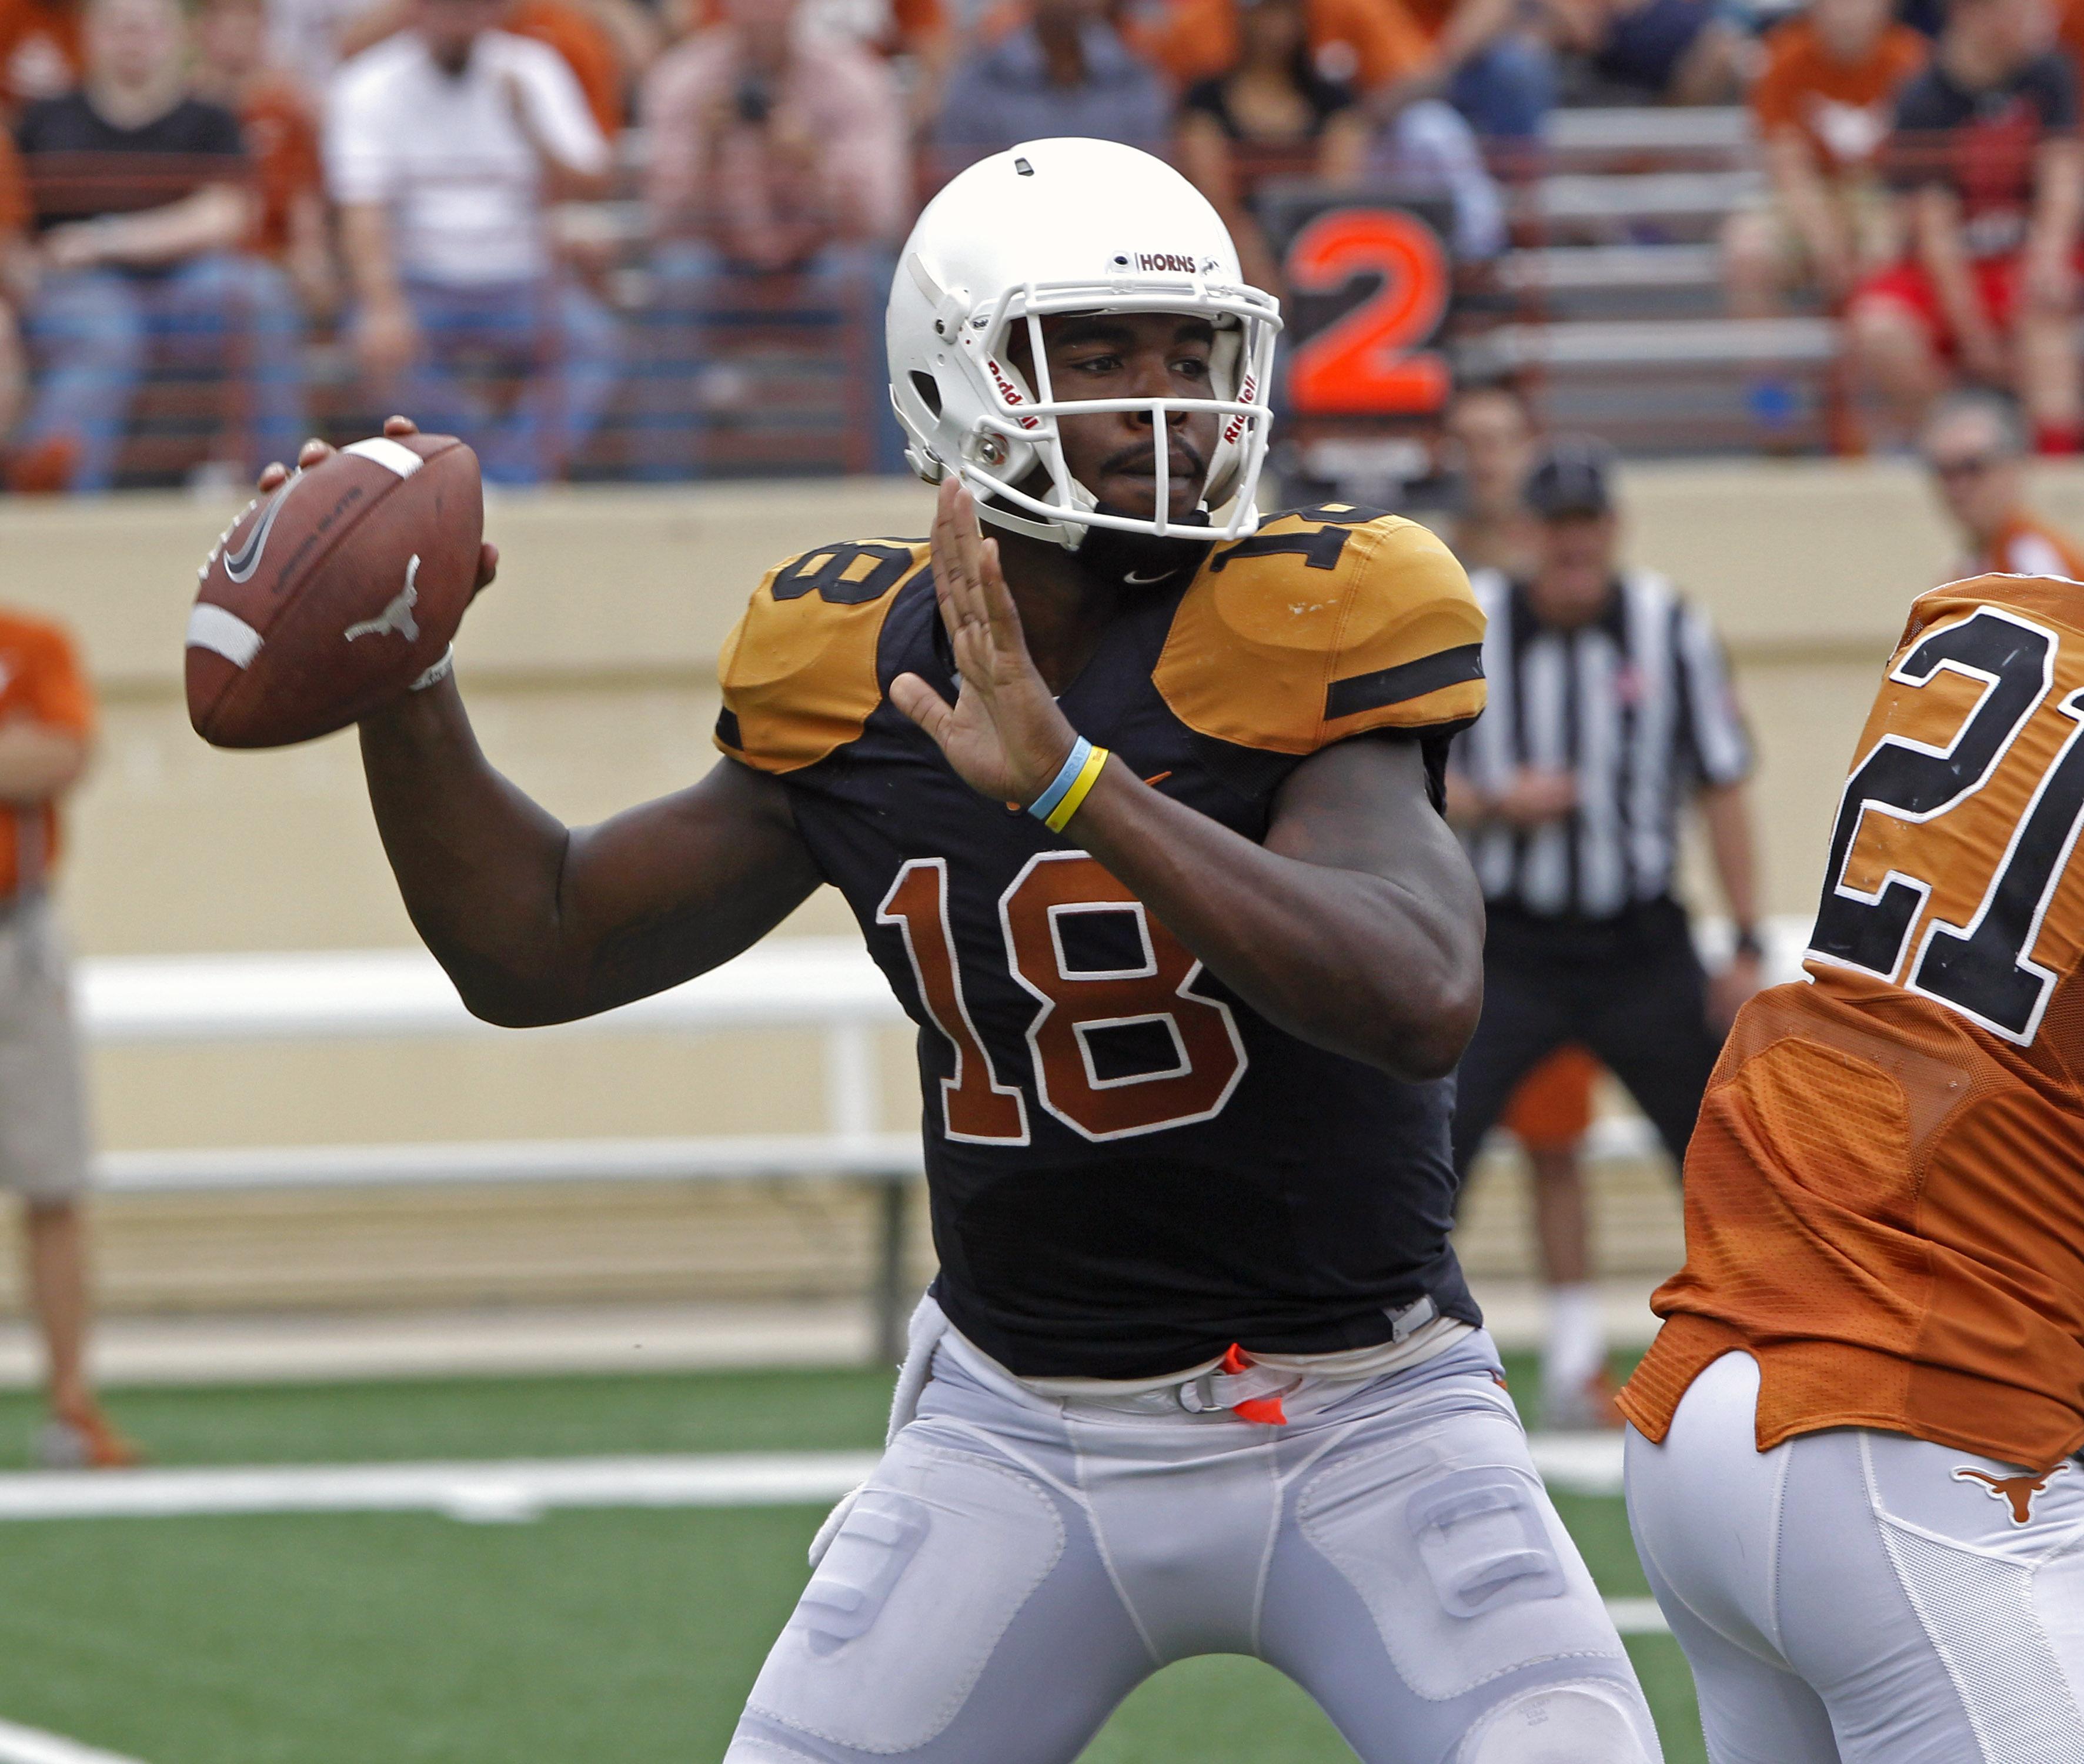 Texas quarterback Tyrone Swoopes (18) looks to throw during the first quarter of Texas' Orange and White spring NCAA college football game, Saturday, April 18, 2015, in Austin, Texas. (AP Photo/Michael Thomas)